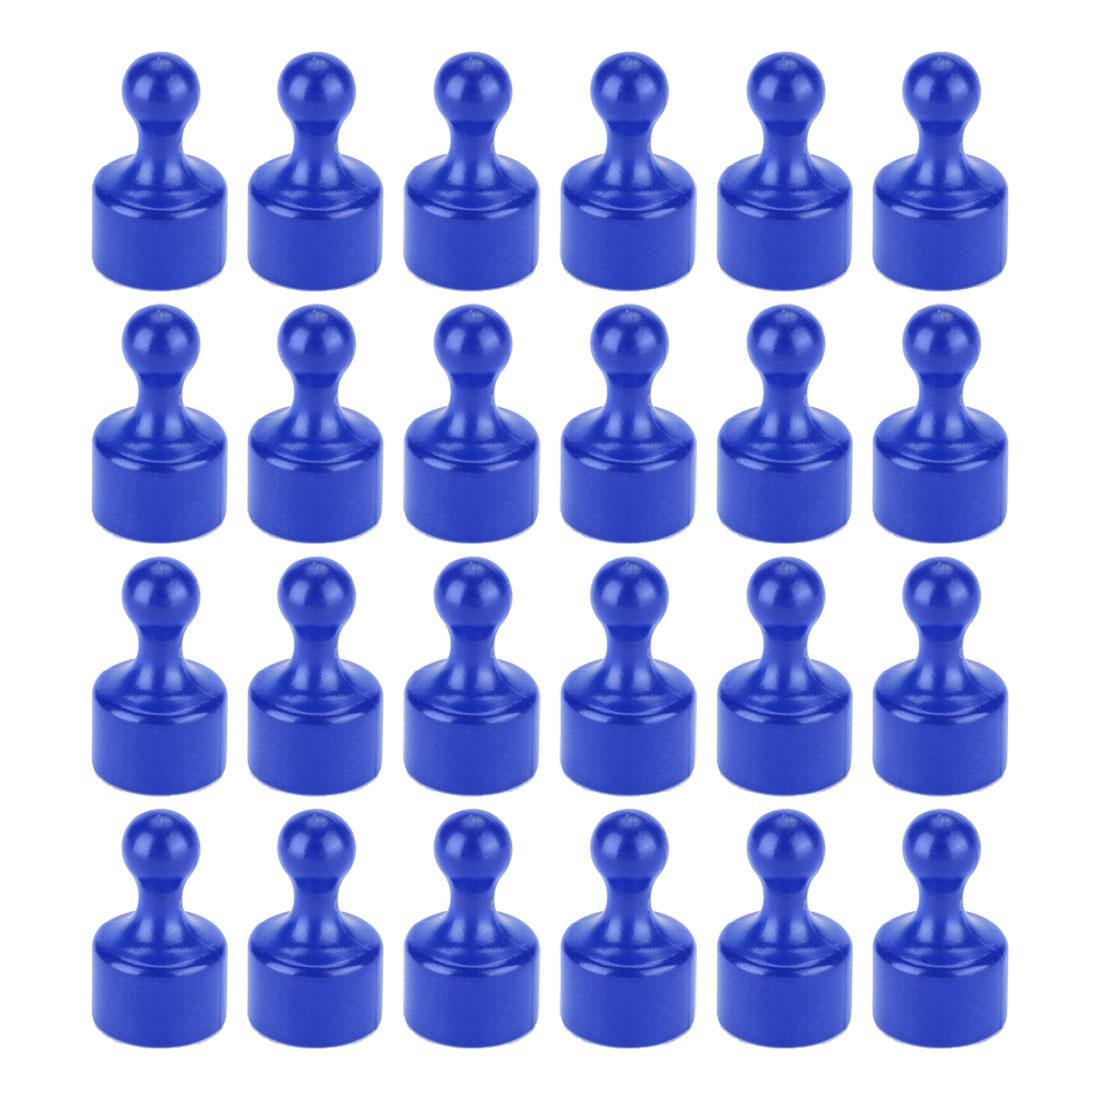 24 Pcs Memo Push Pin Magnets Fridge Kitchen Office Bulletin Boards Blue